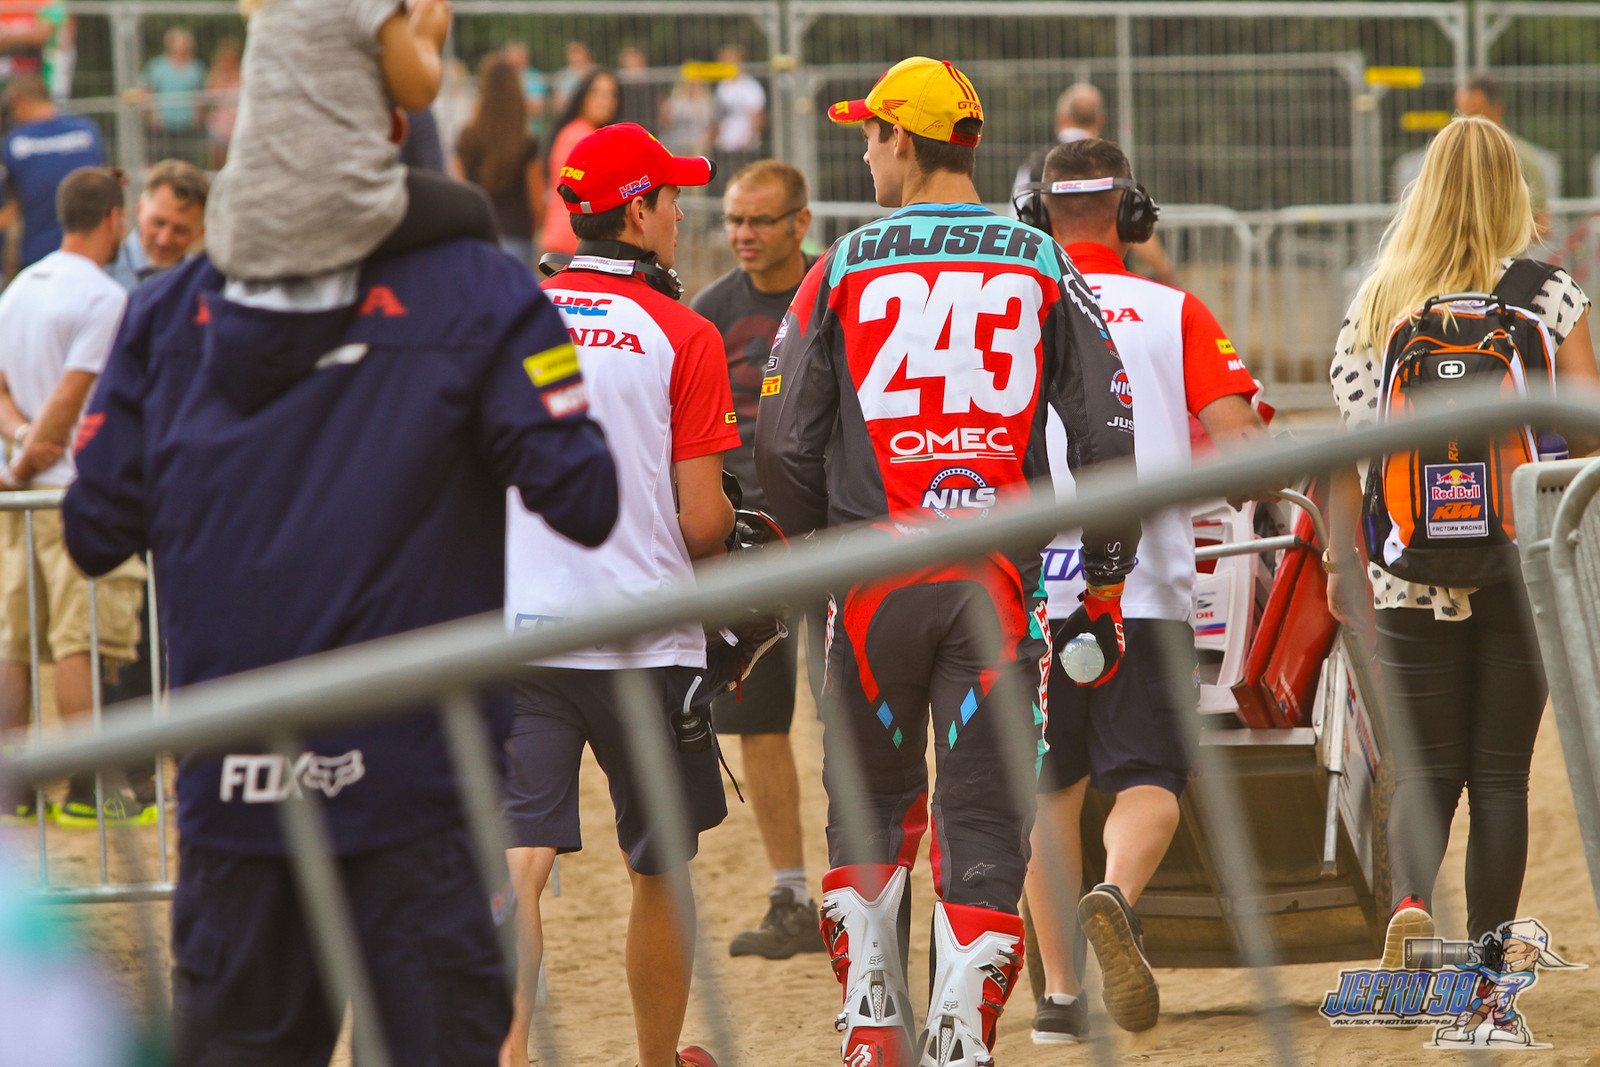 Tim Gajser - Photo Gallery: MXGP of Limburg - Motocross Pictures - Vital MX